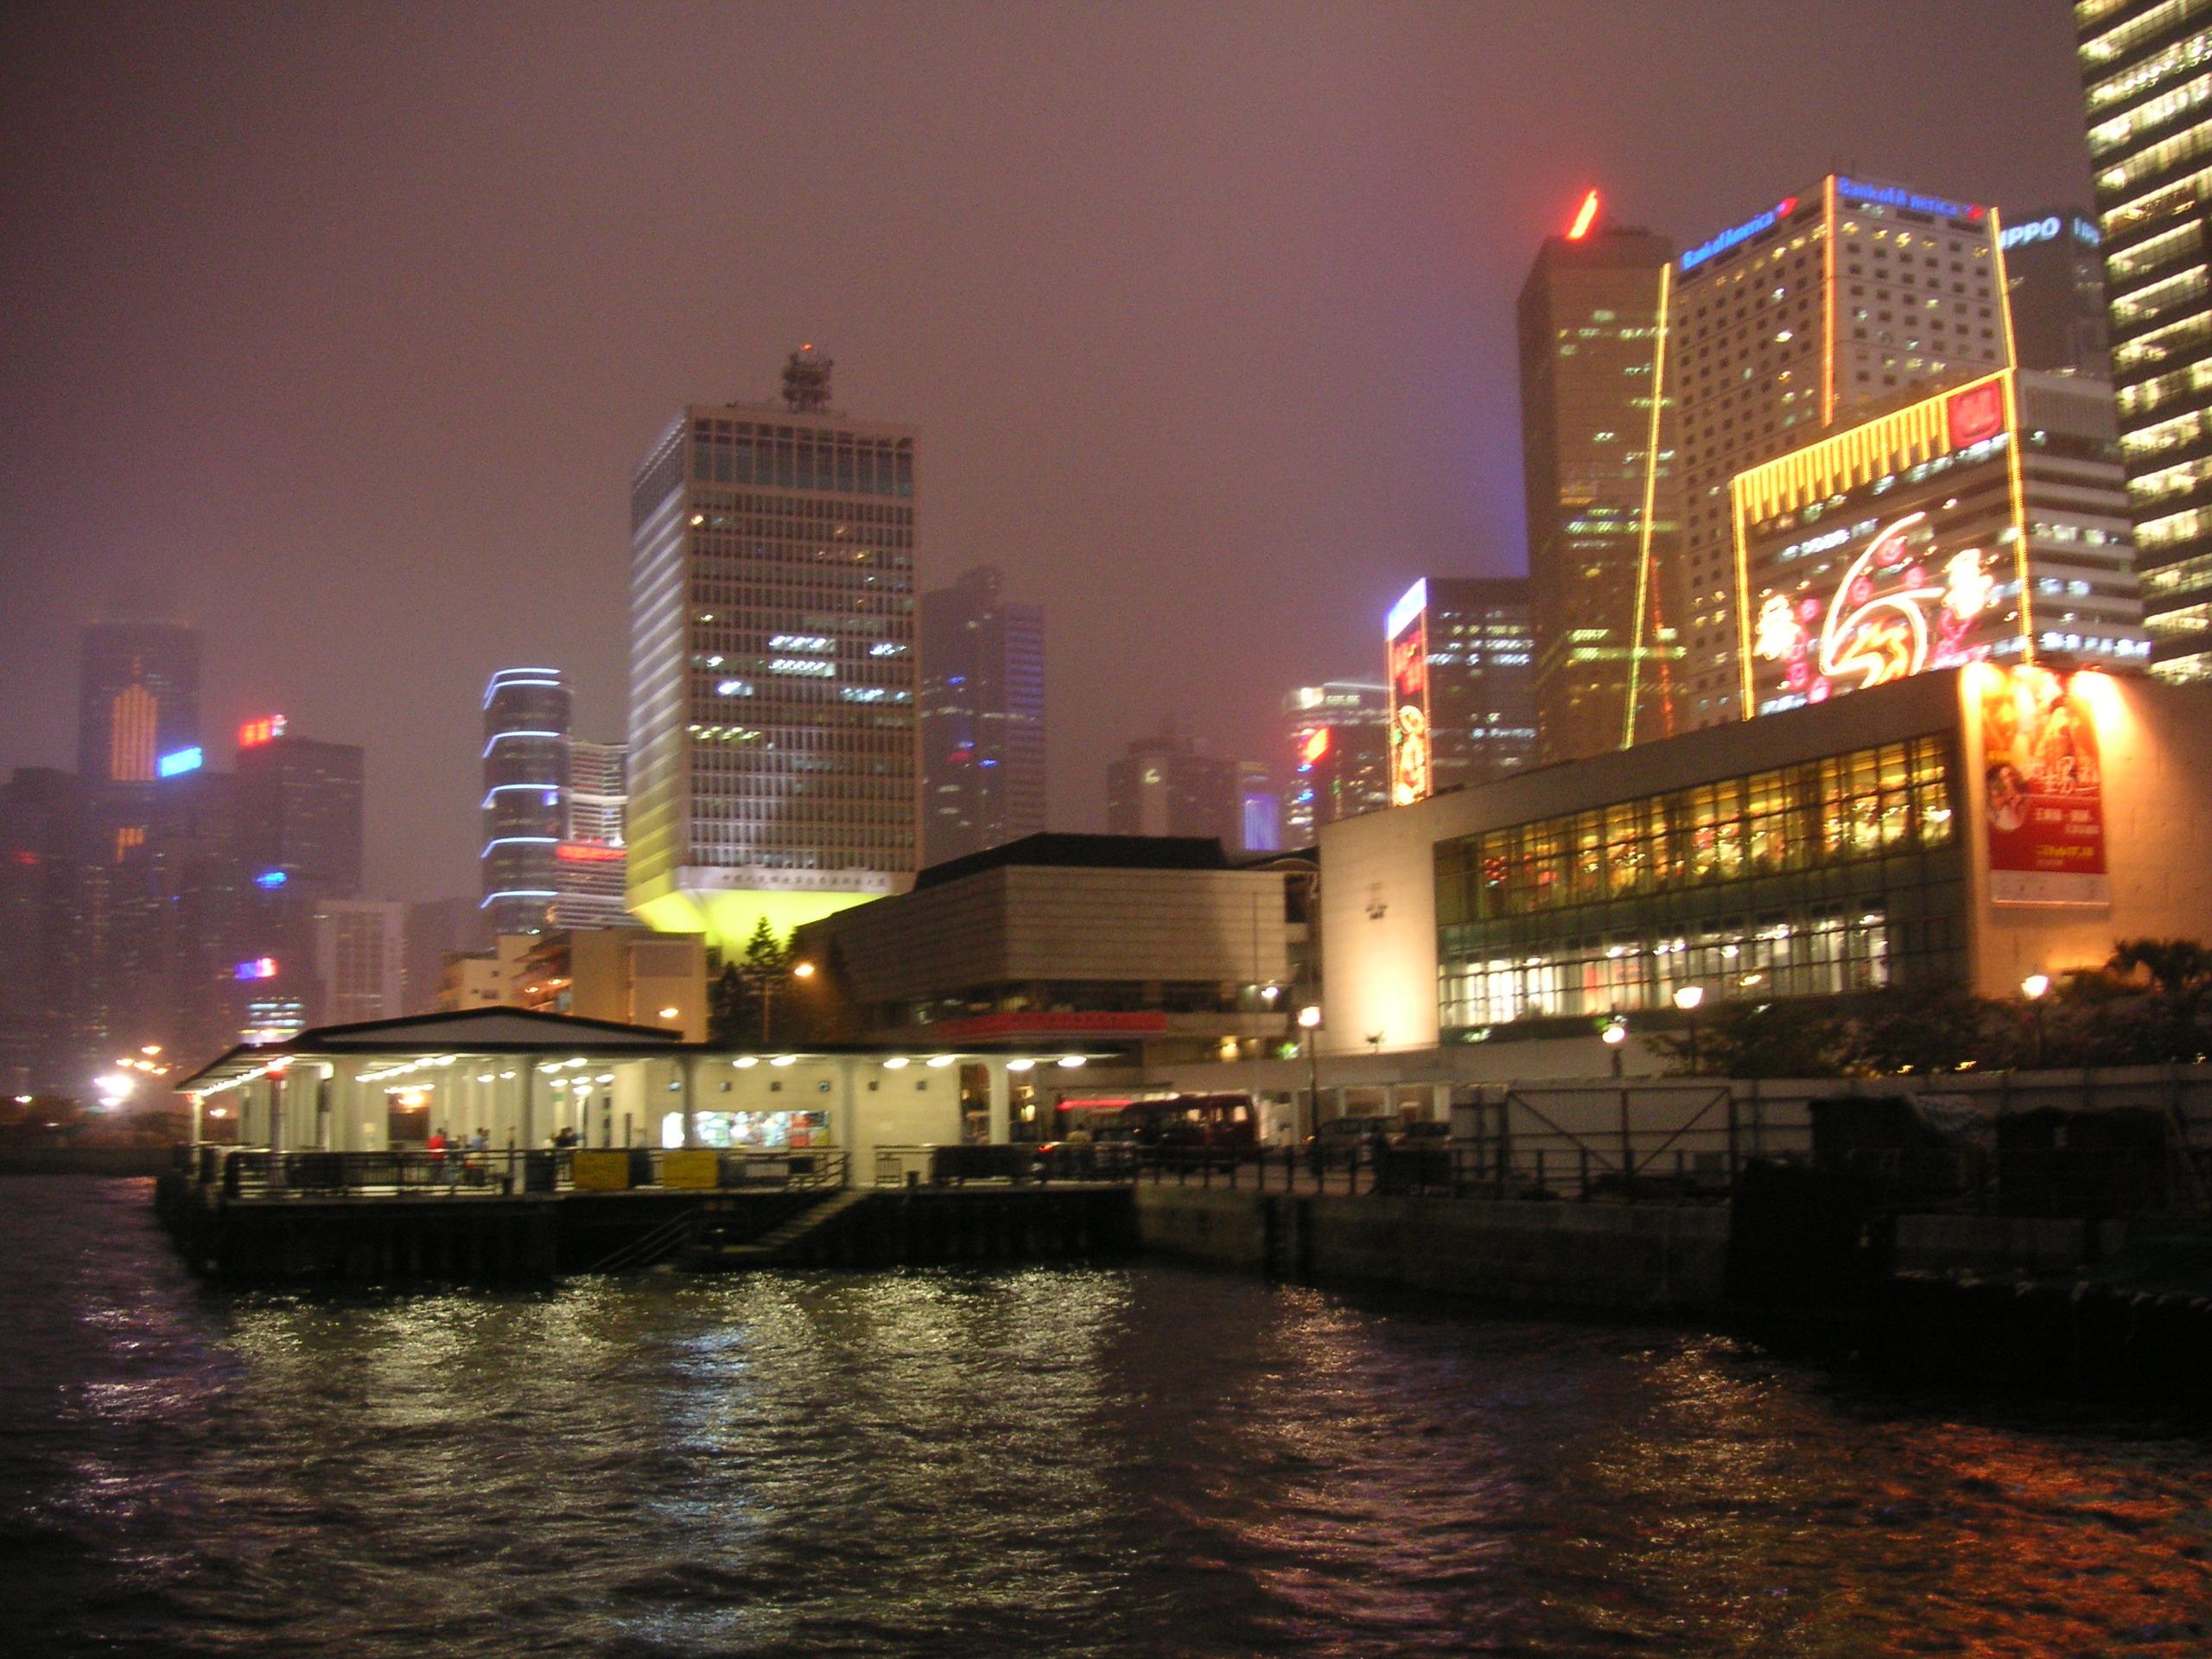 Queen's Pier, Central